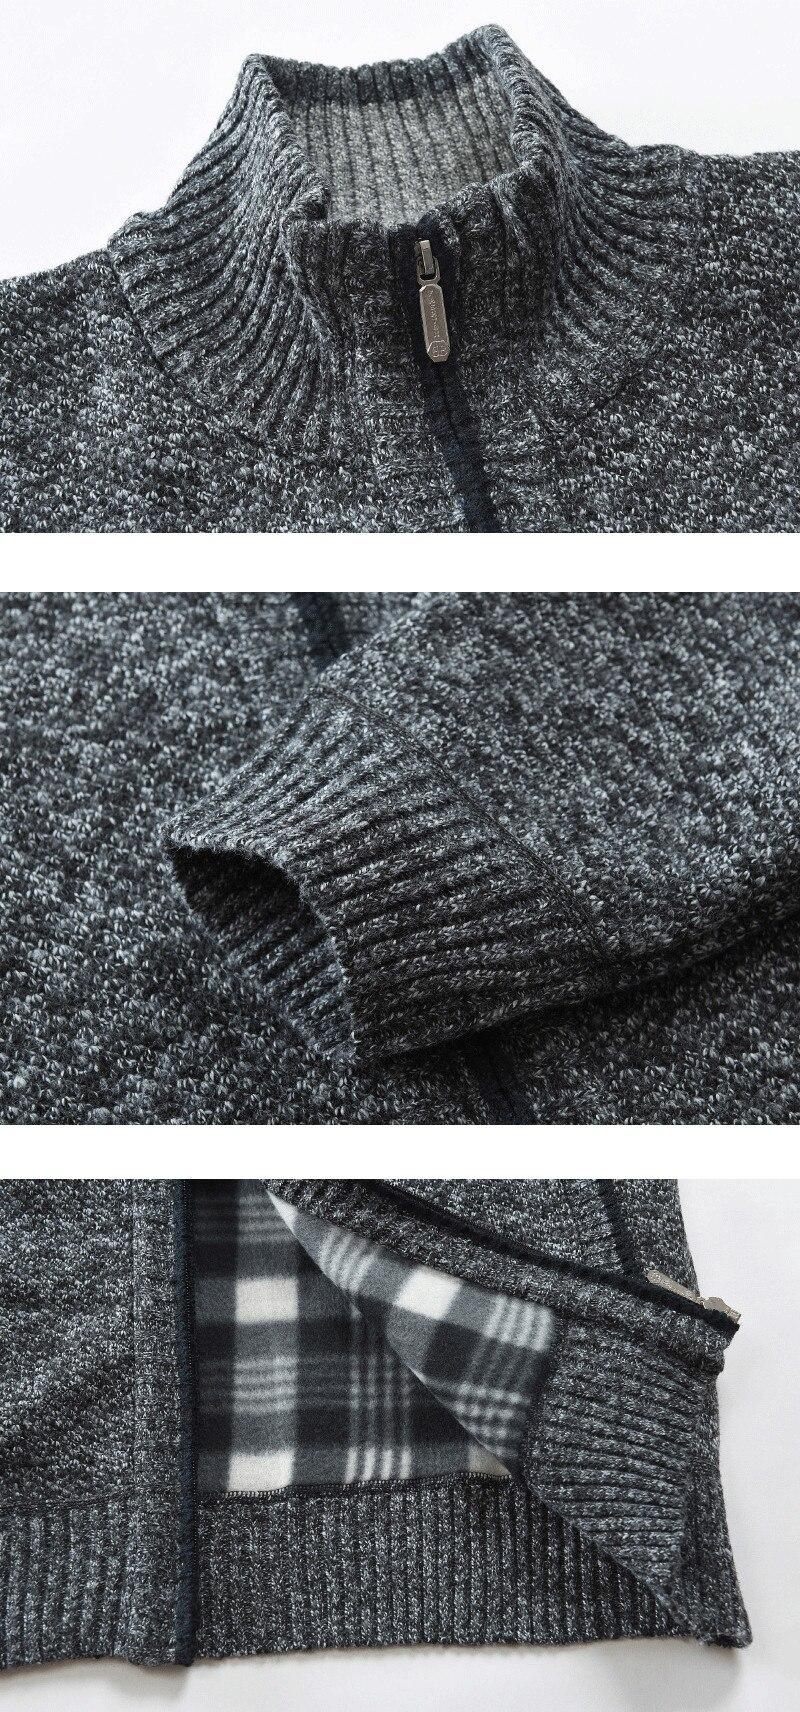 H97affe407dc2448e9e8ffcb38213266aj NEGIZBER 2019 Autumn Winter New Men's Jacket Slim Fit Stand Collar Zipper Jacket Men Solid Cotton Thick Warm Jacket Men